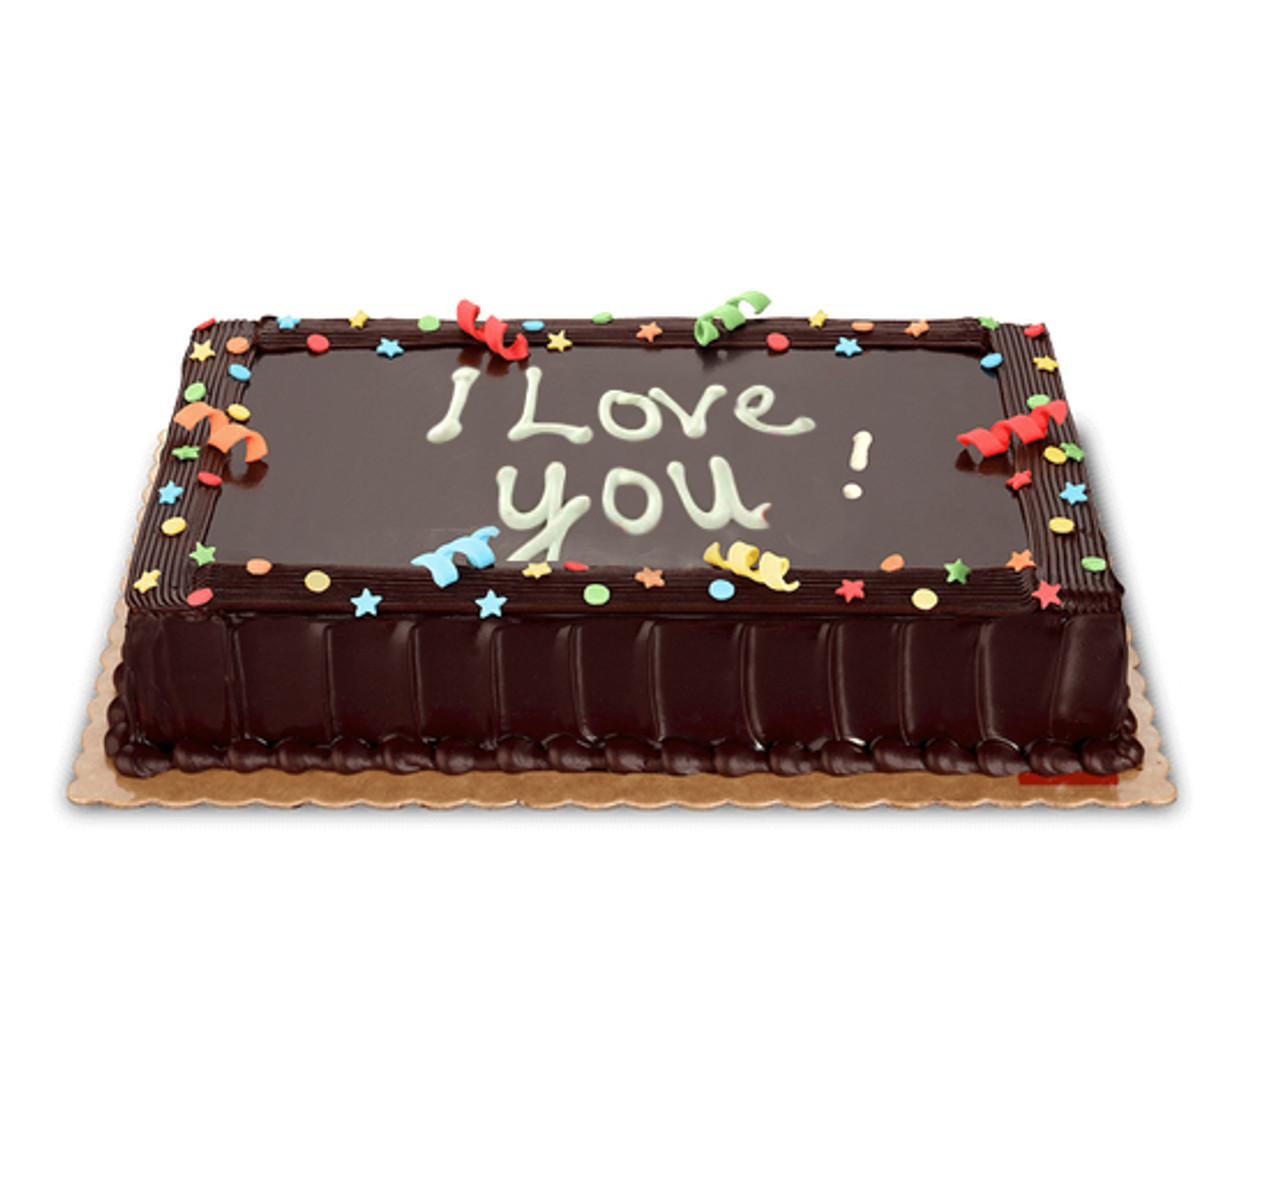 I love you Choco Cake Medium (8x12)